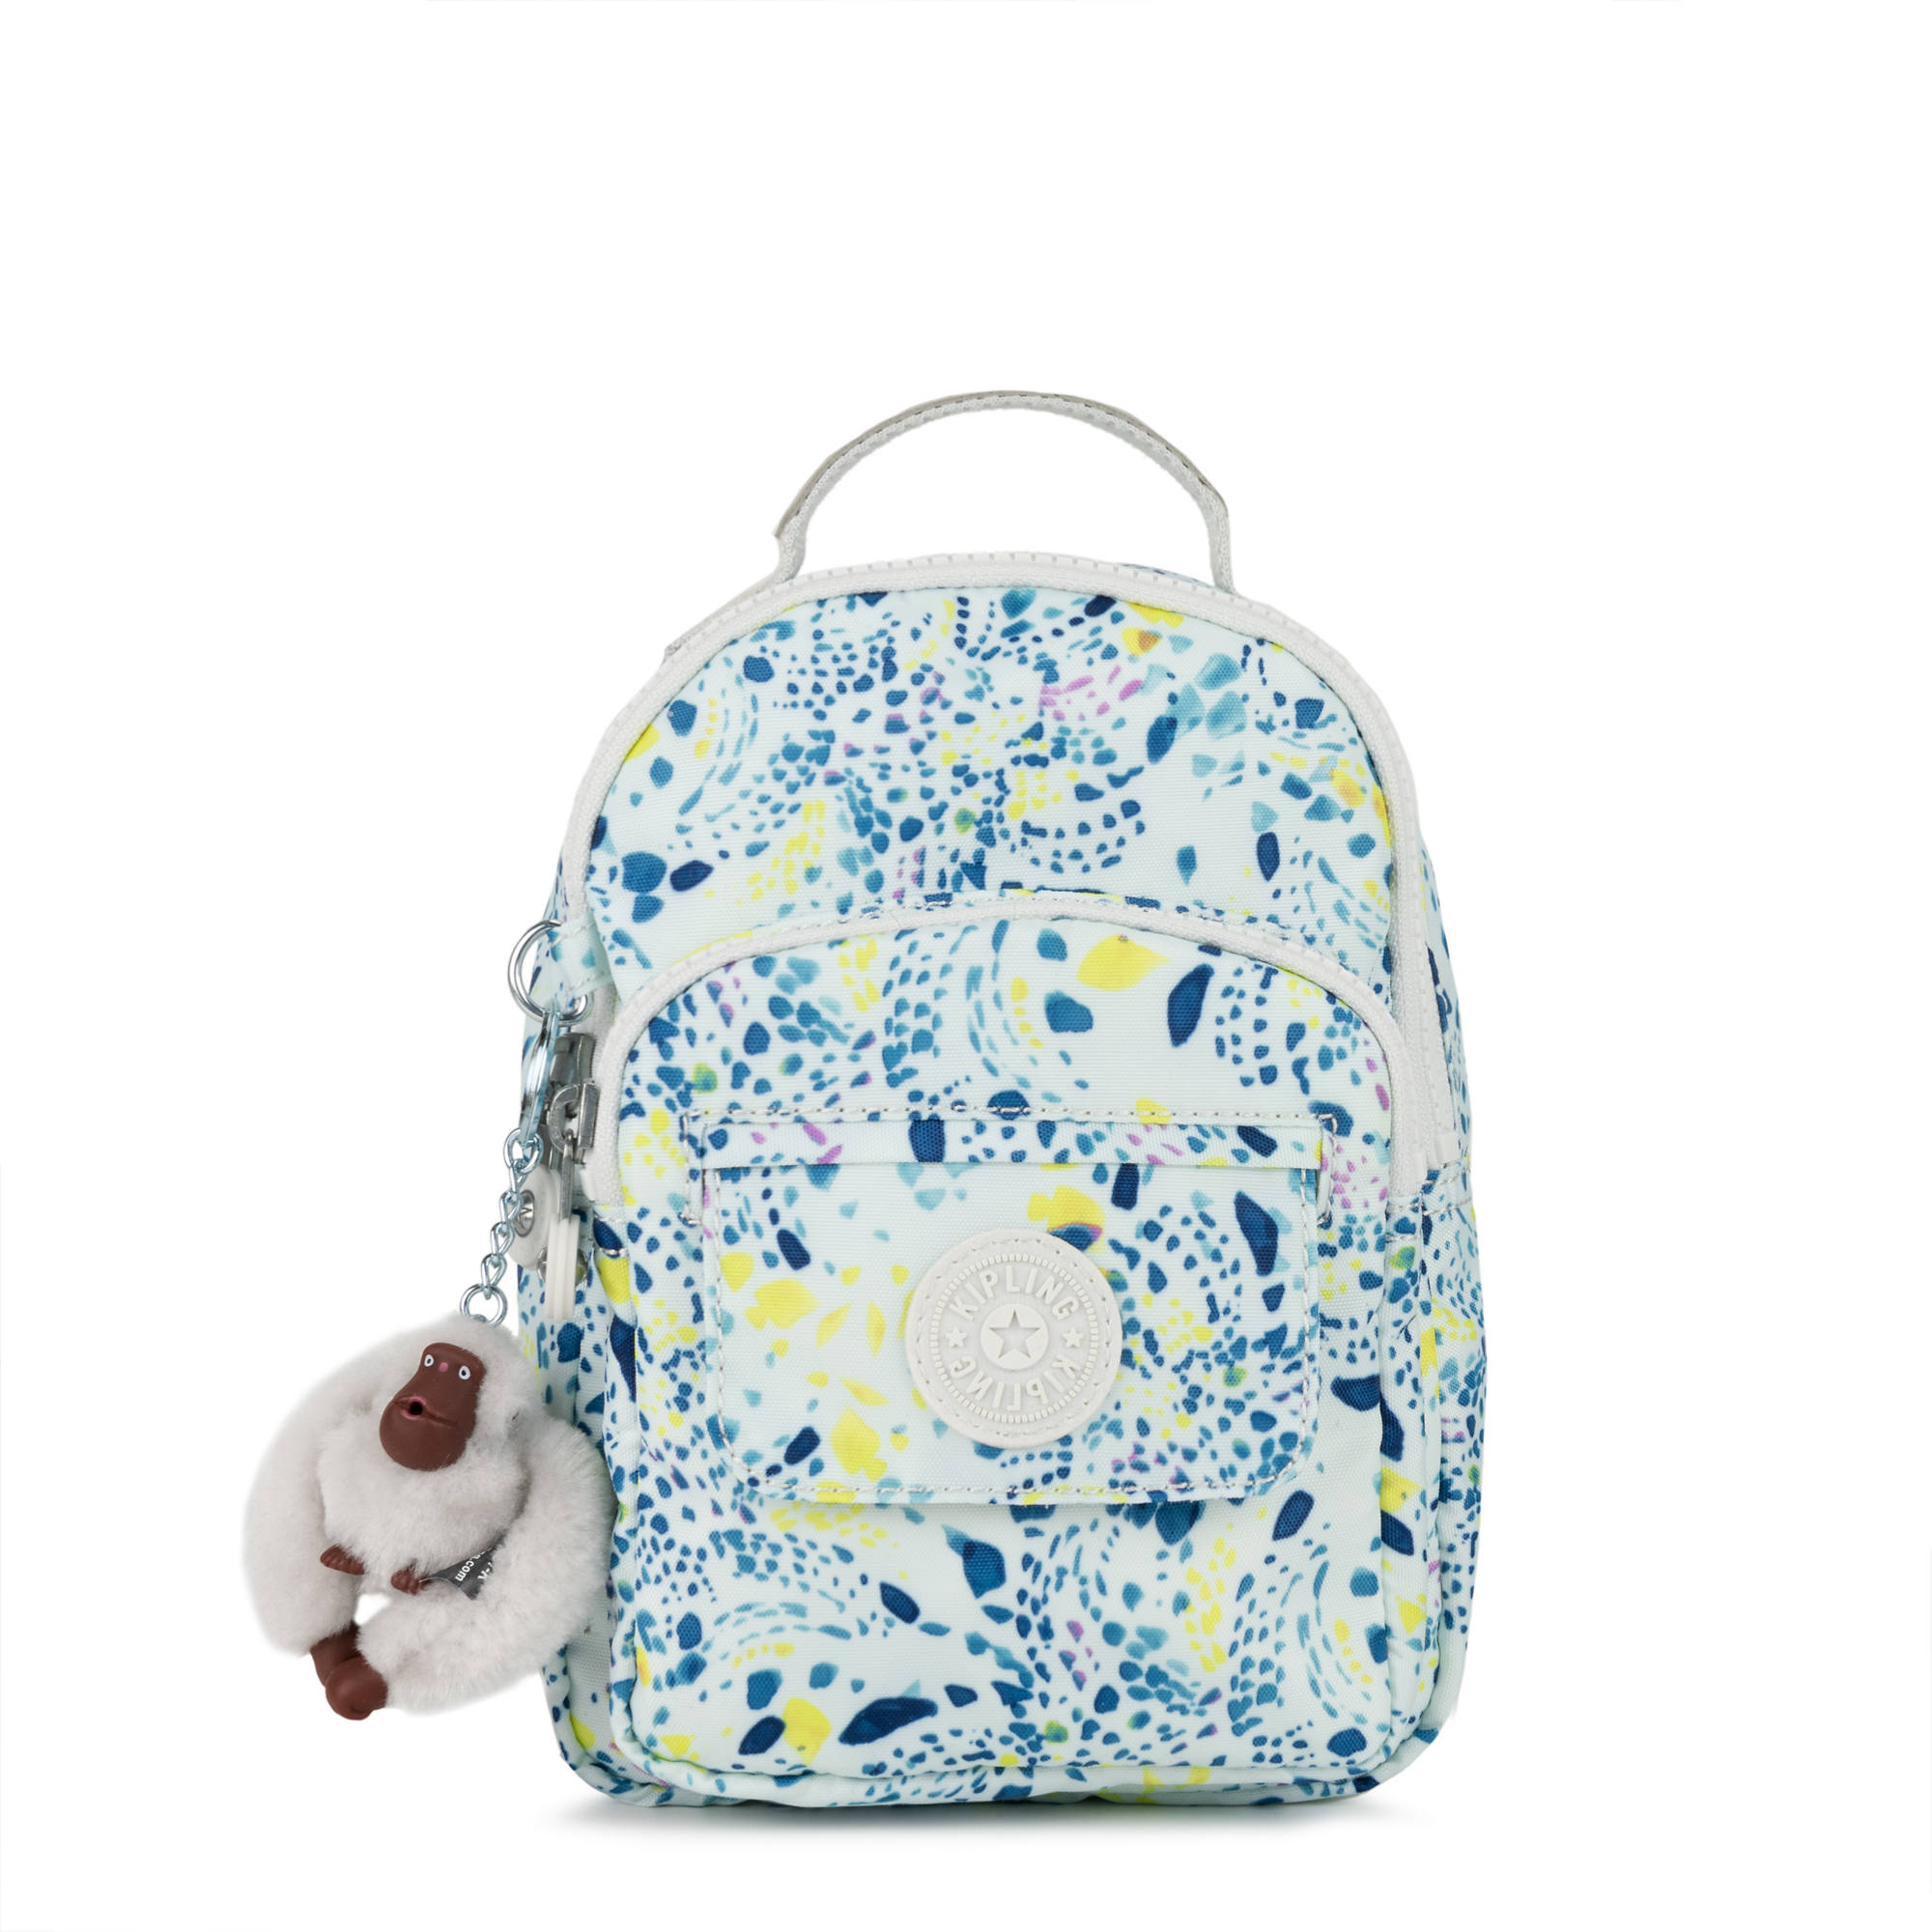 3fa3a110a4 Alber 3-In-1 Convertible Mini Bag Printed Backpack